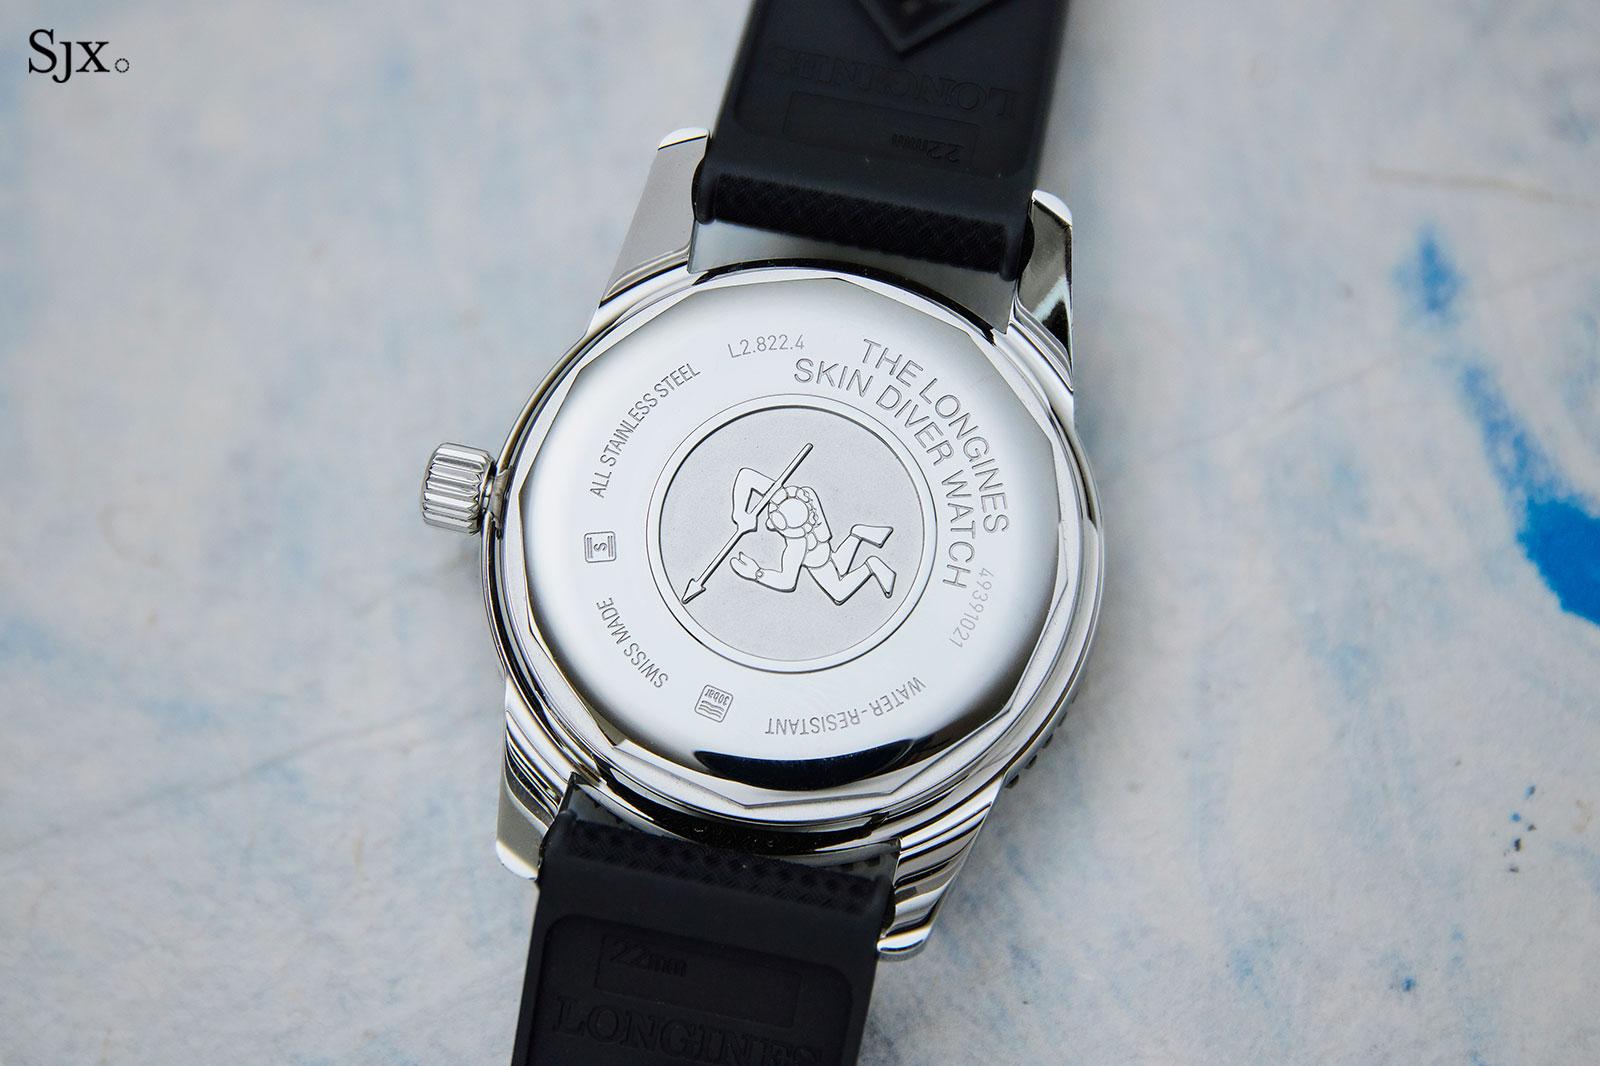 Longines Skin Diver watch 2